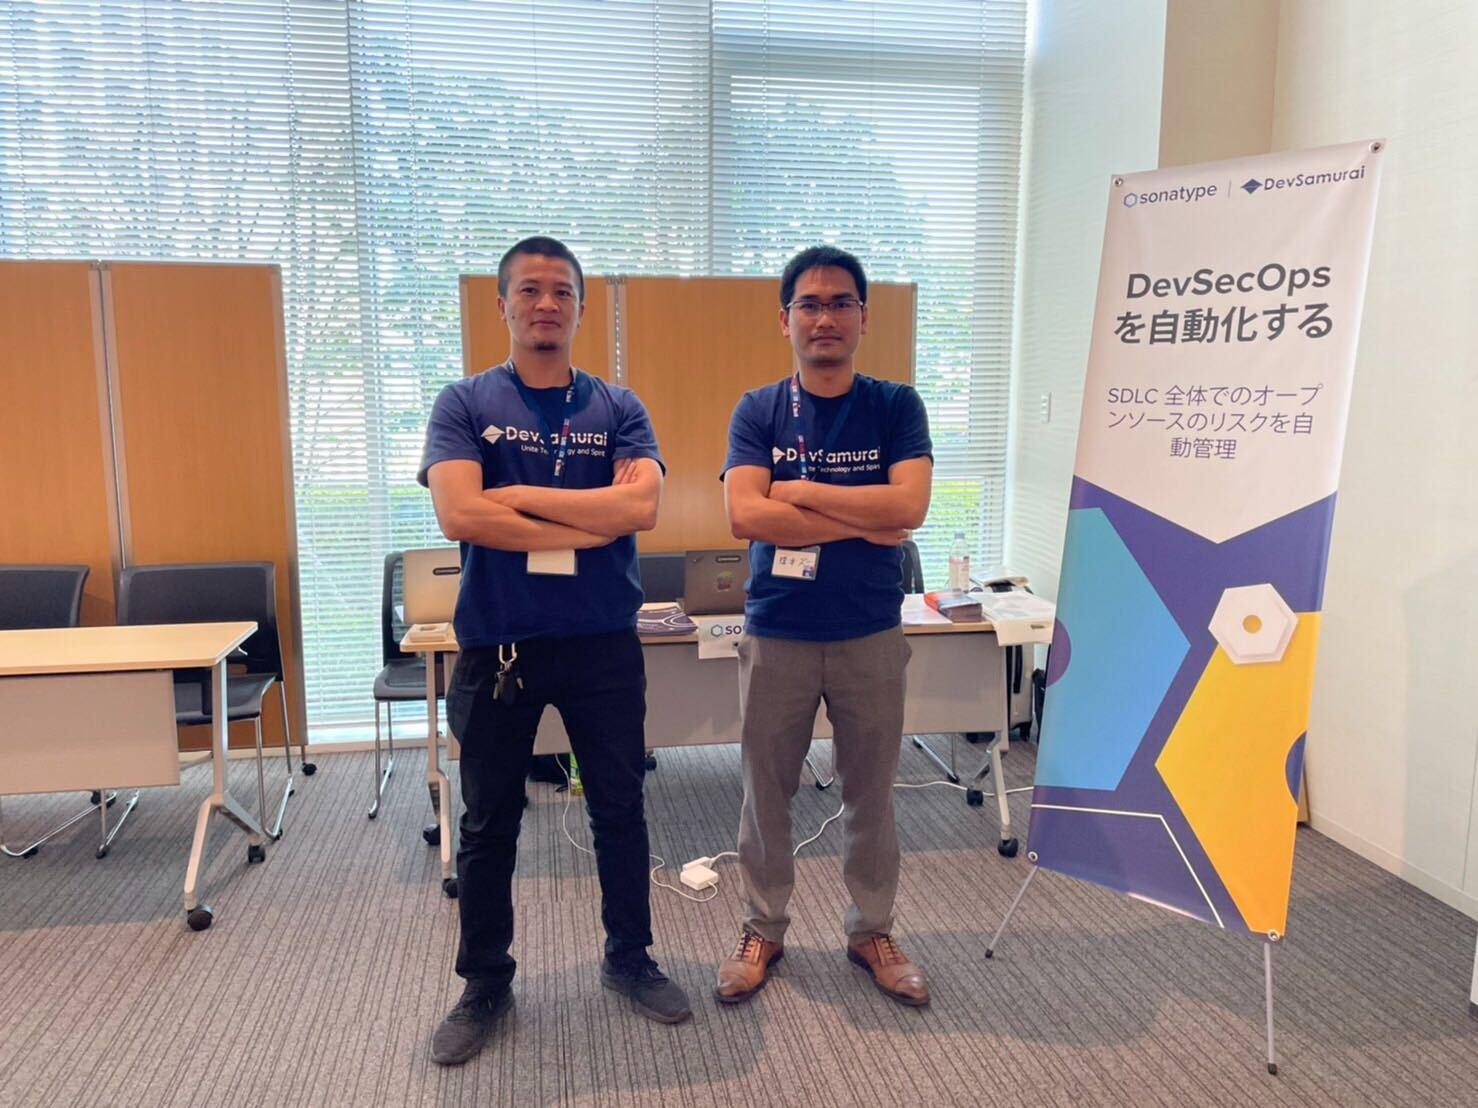 DevSamuraiはSonatypeと共にDevOps Days Tokyoに出展しました